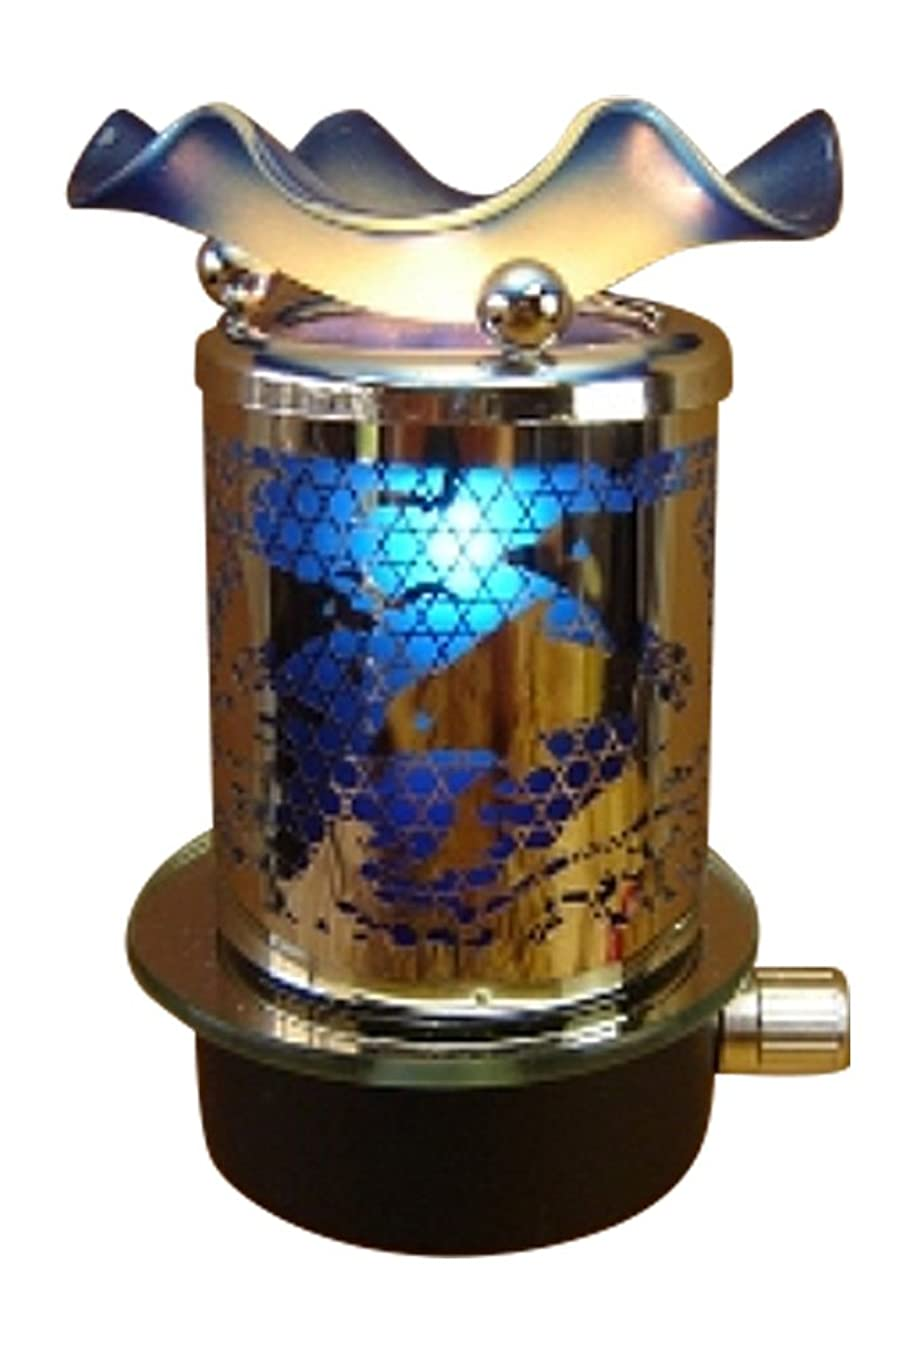 L&V Electric Metal Plug In Night Light Wax Burner Oil Warmer Blue Dolphins Design